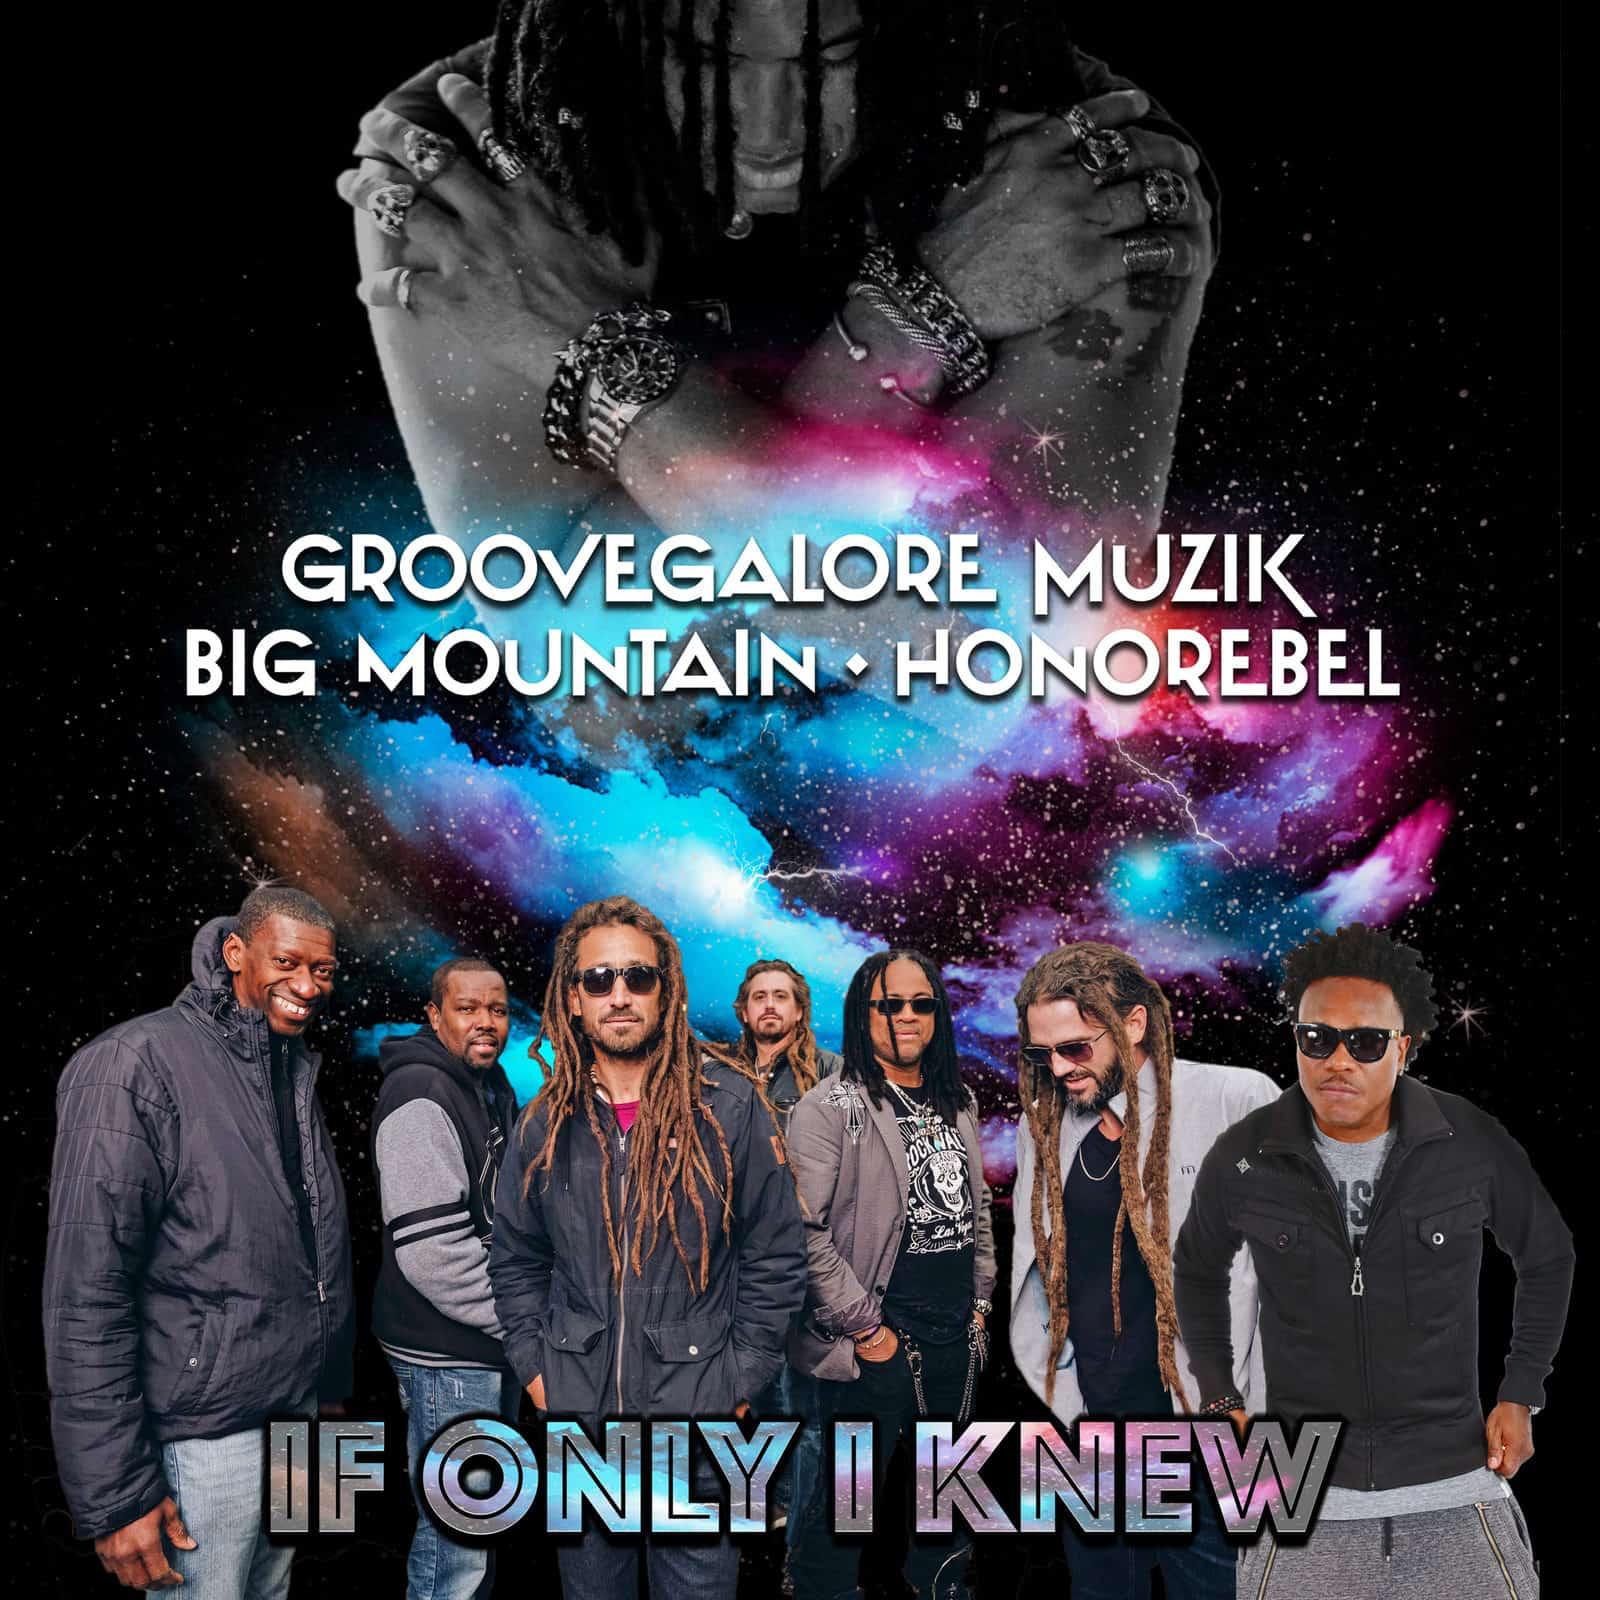 GrooveGalore MuziK, Big Mountain, Honorebel - If Only I Knew